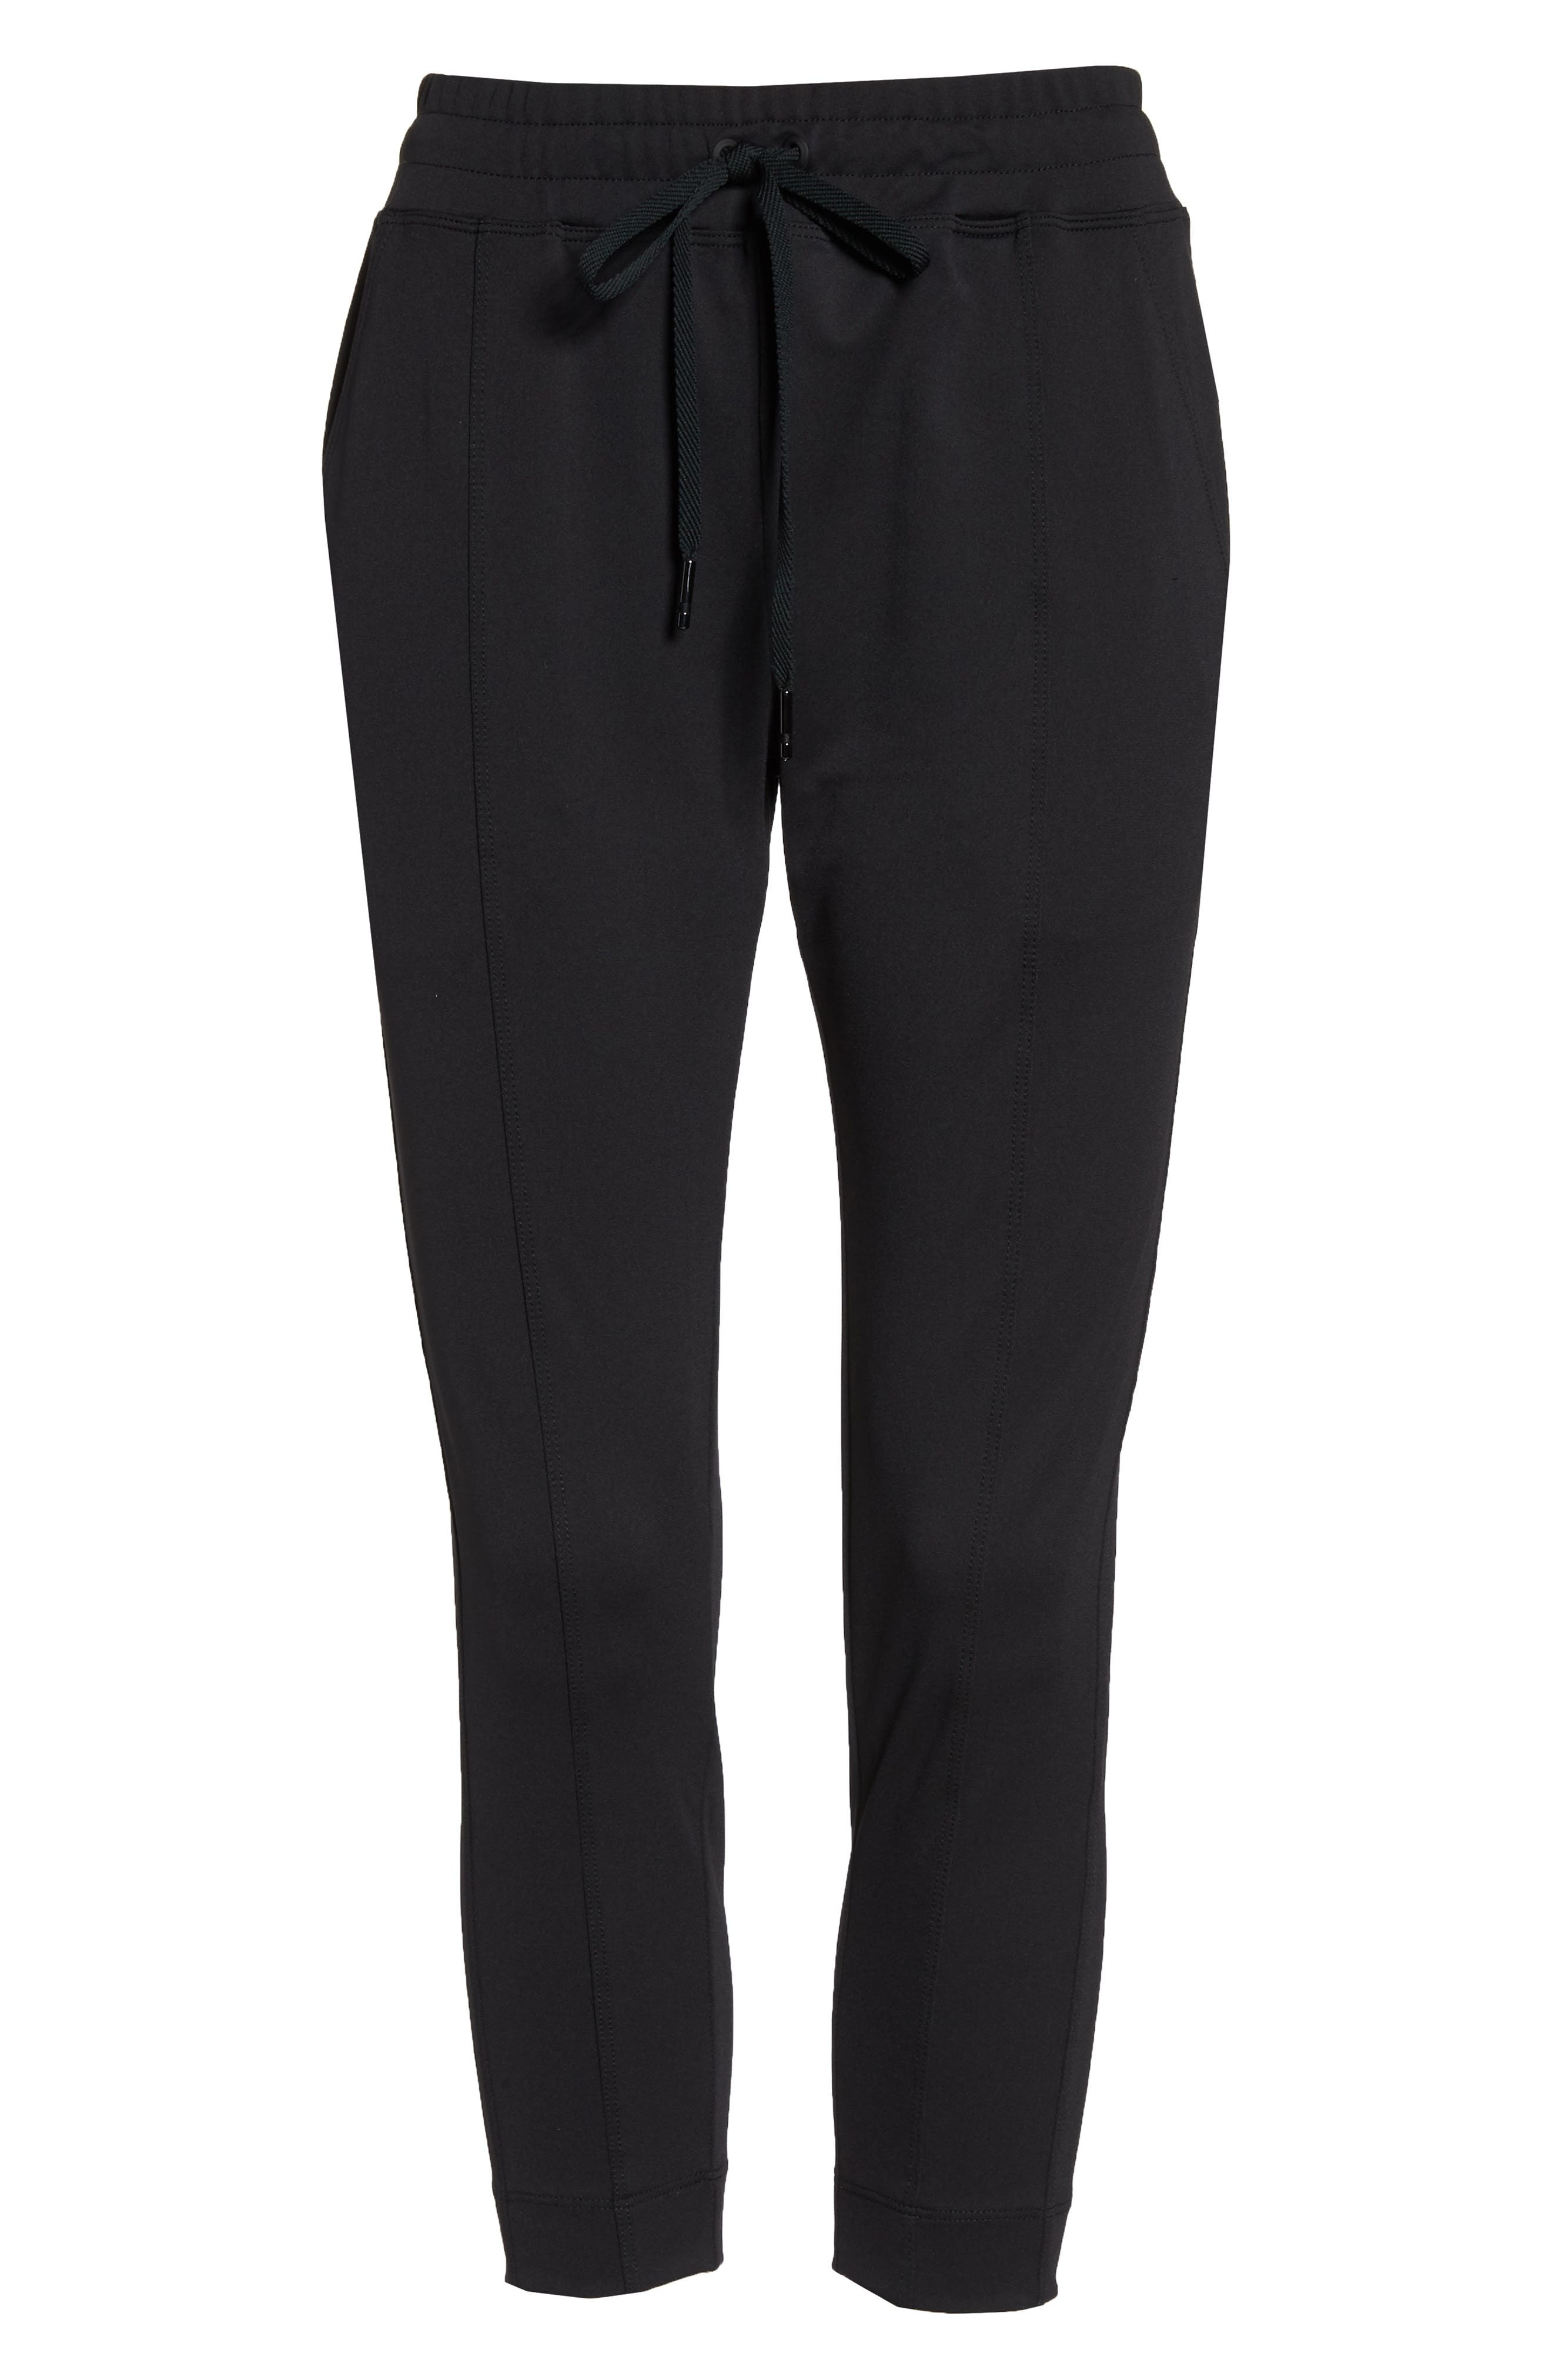 Mica Crop Track Pants,                             Alternate thumbnail 7, color,                             Black